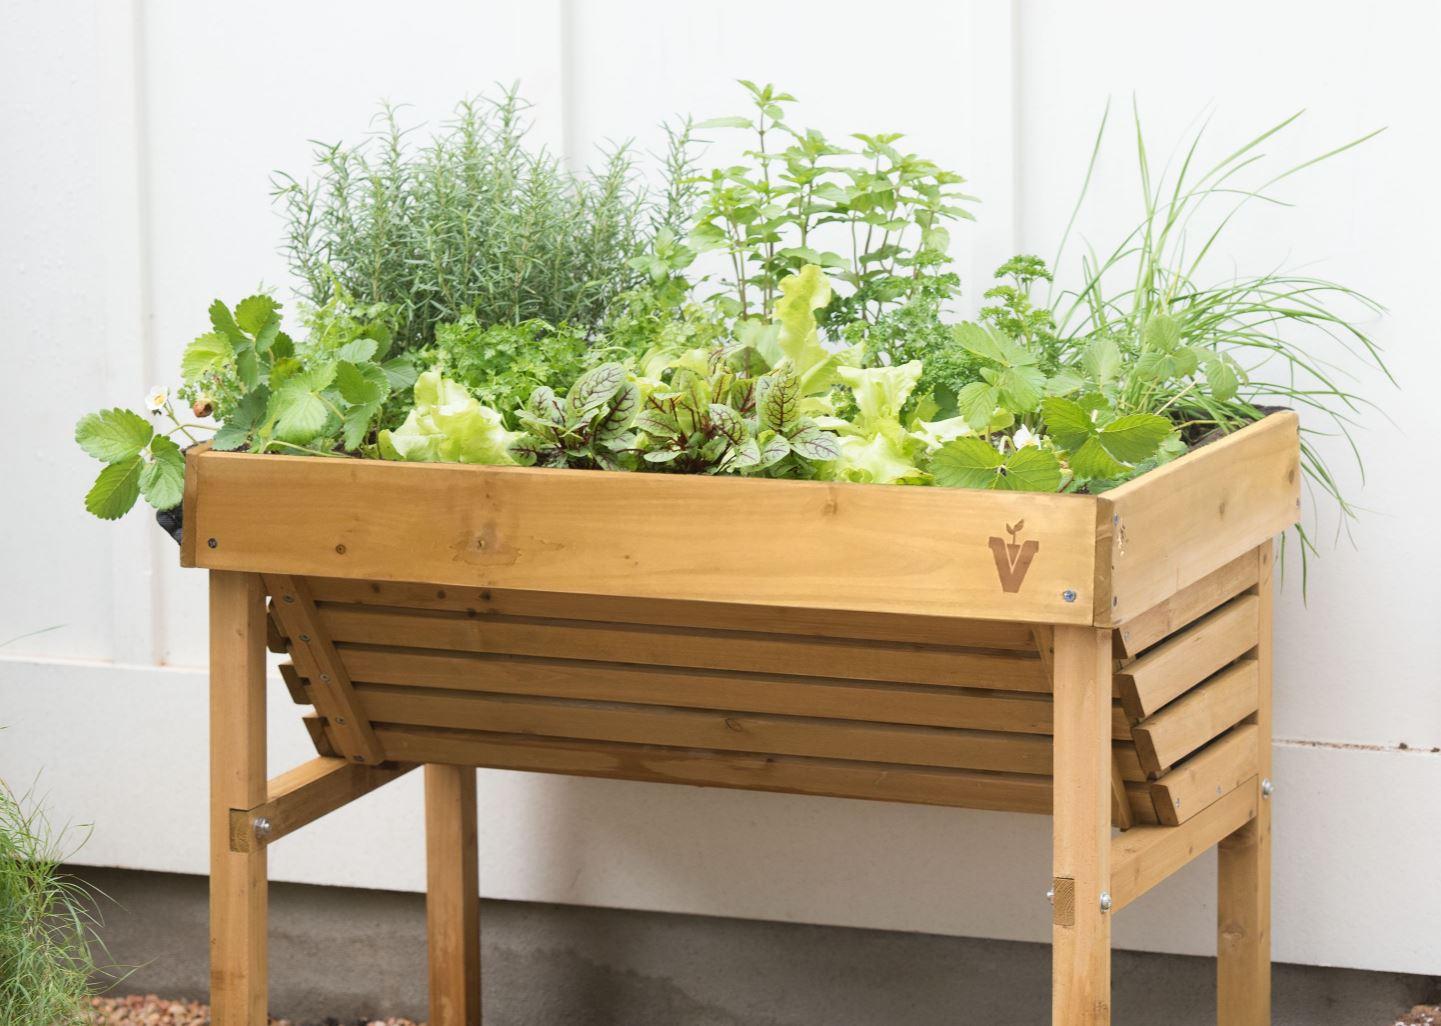 Herb Garden Growing Herbs Gardener, How To Start A Raised Herb Garden